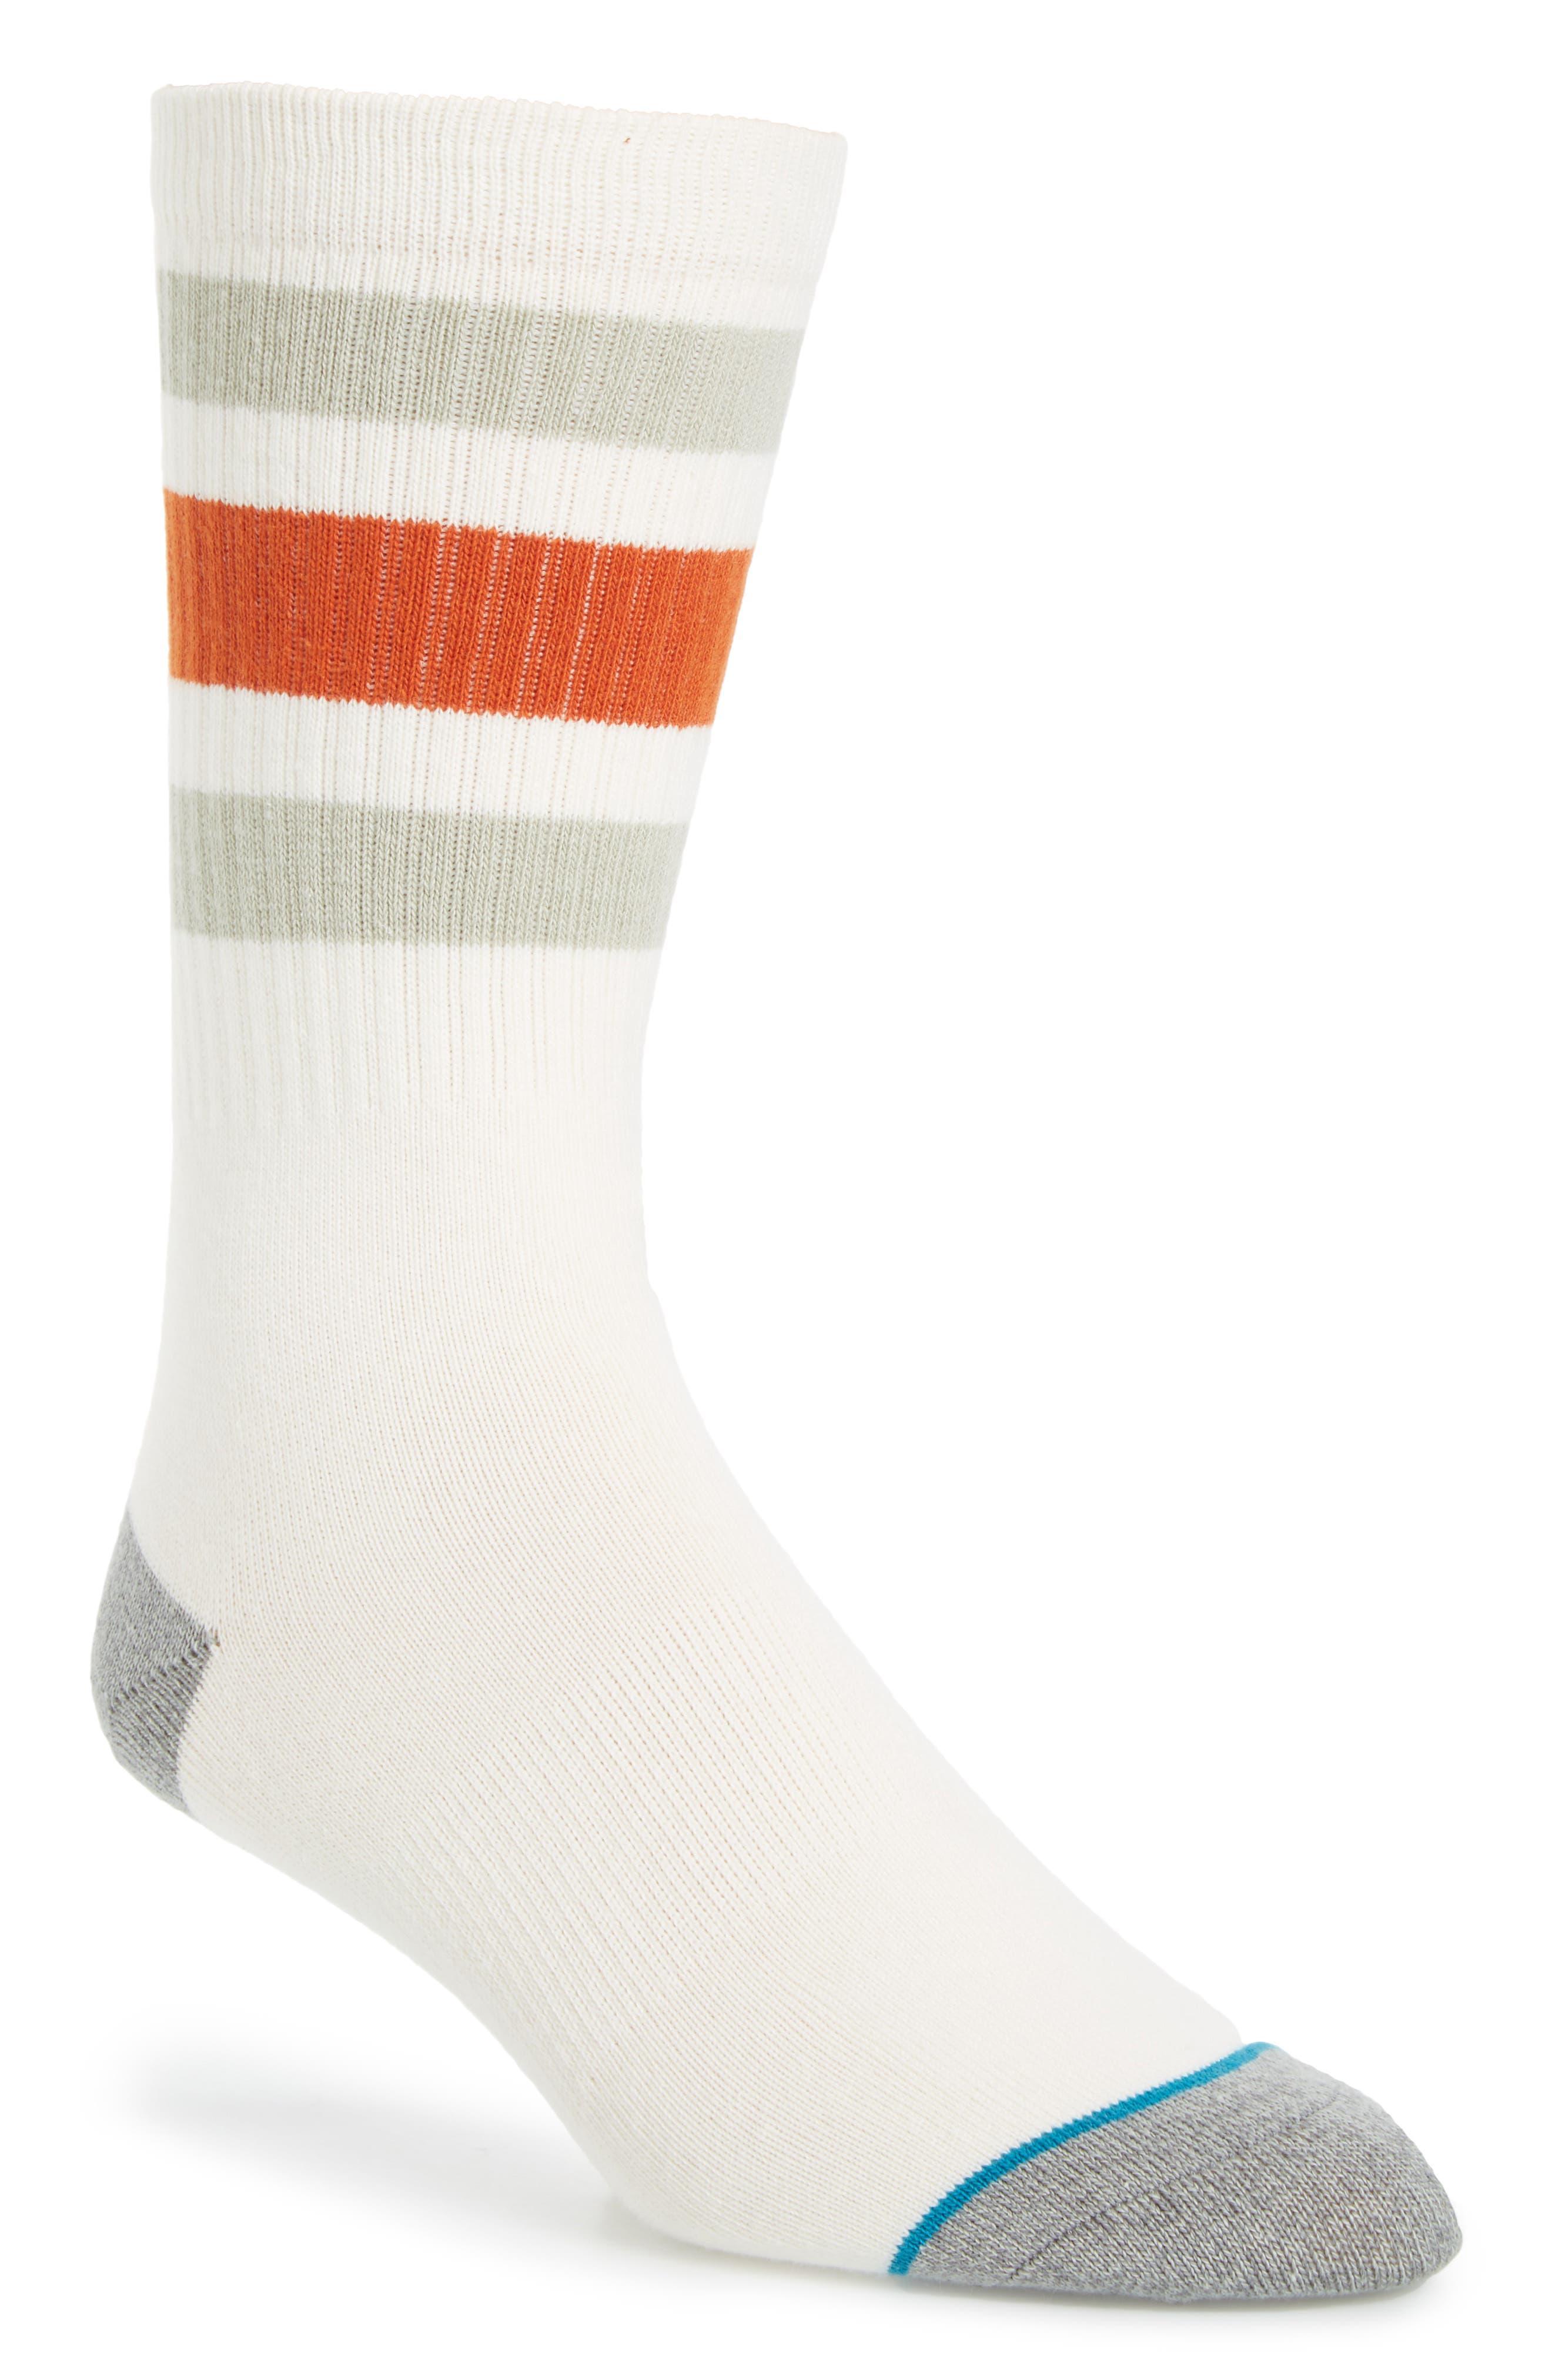 Stripe Crew Socks,                             Main thumbnail 1, color,                             Natural